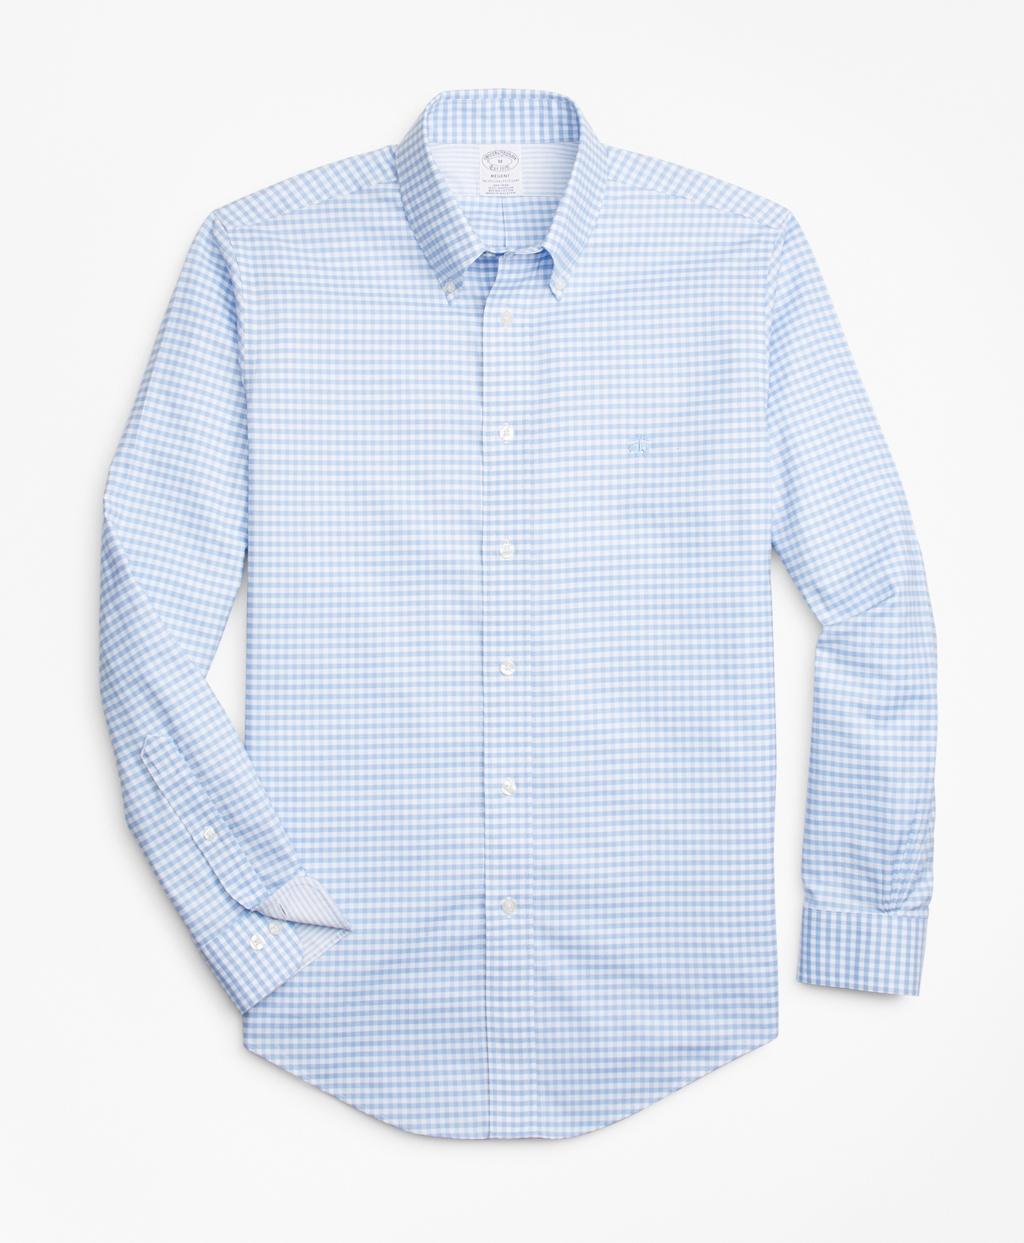 c0f891c9b1e Non-Iron Regent Fit Gingham Sport Shirt - Brooks Brothers